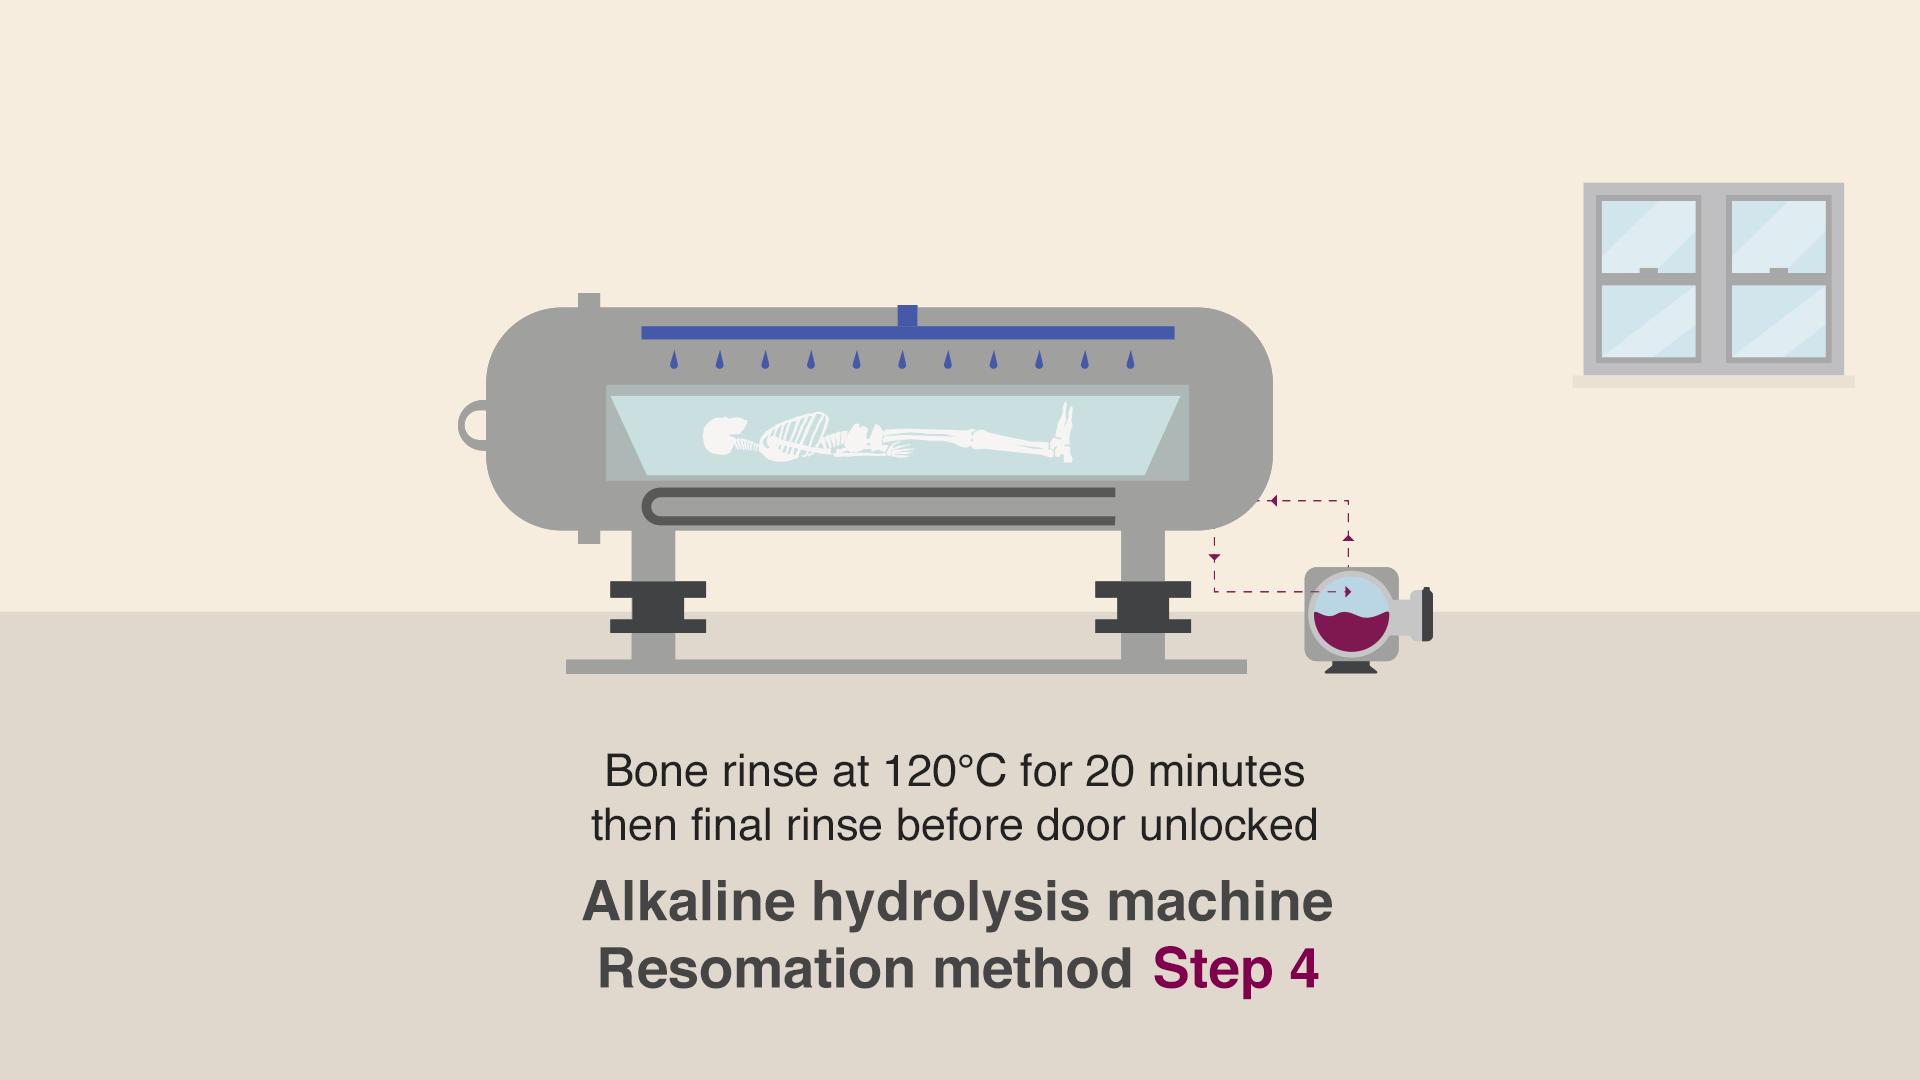 Dissolving the dead - alkaline hydrolysis a new alternative